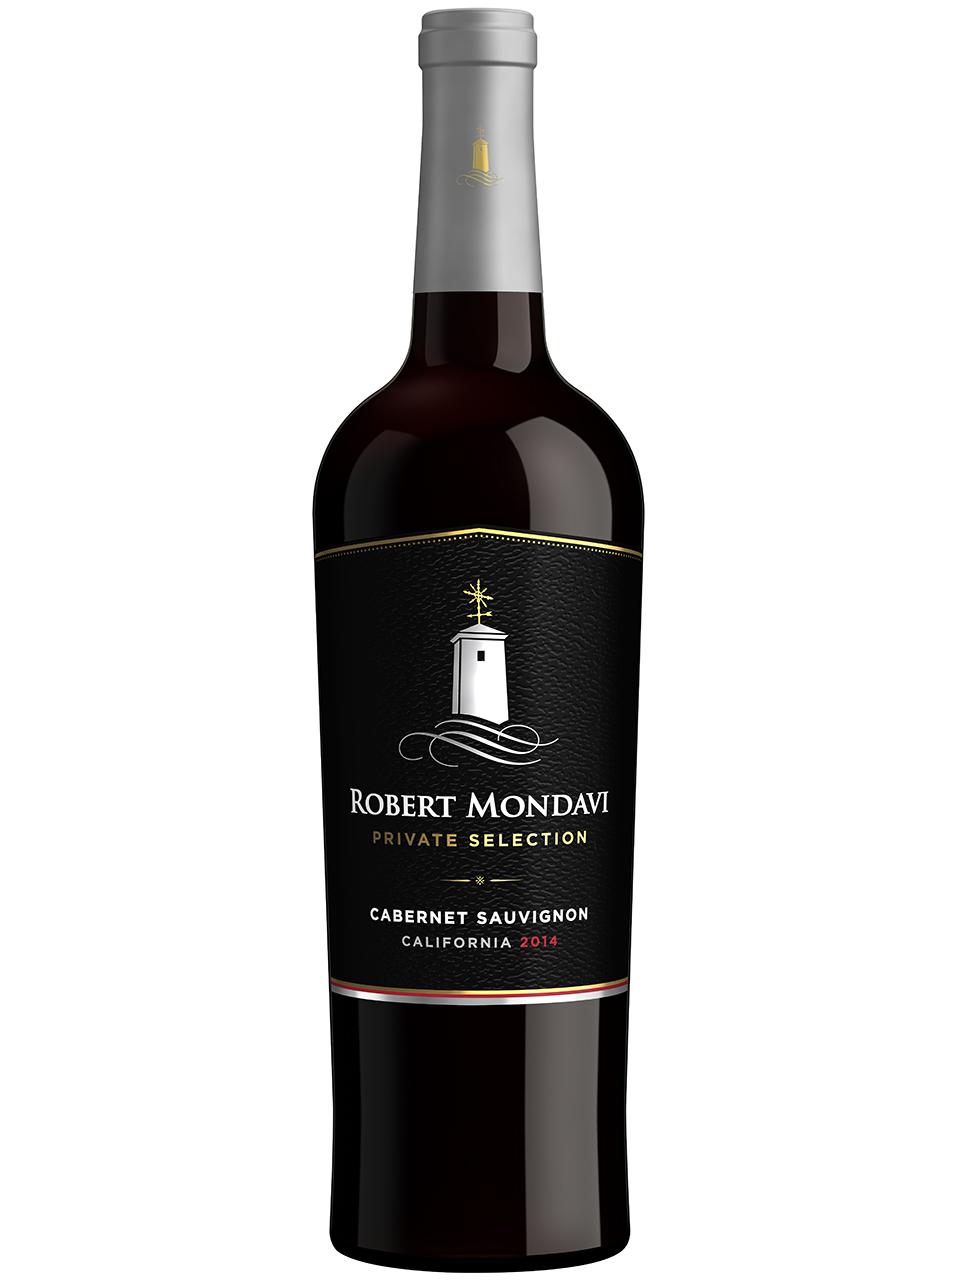 Robert Mondavi Private Selection CabernetSauvignon